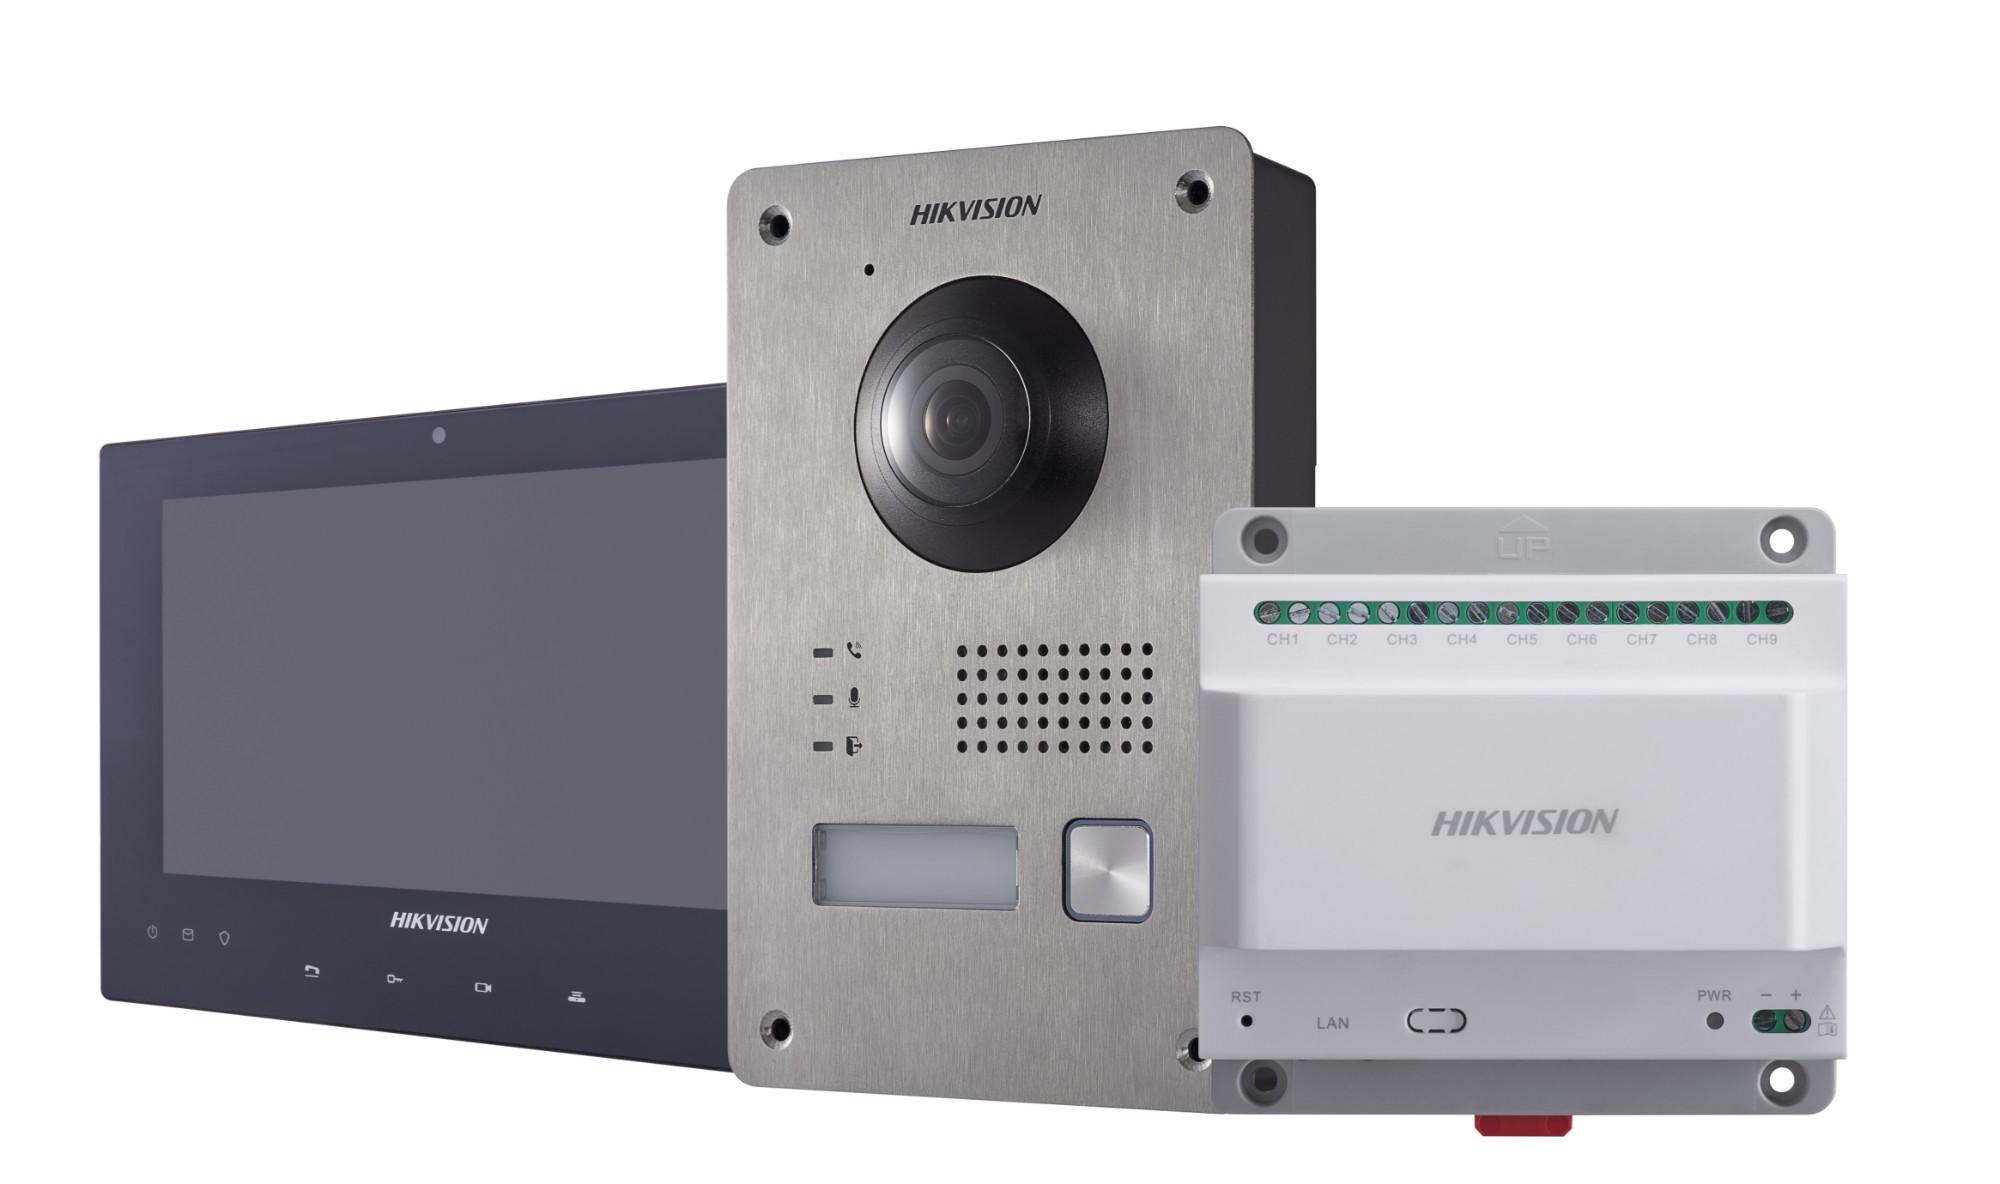 Hikvision DS-KIS701 2-Wire Video Door Intercom KIT